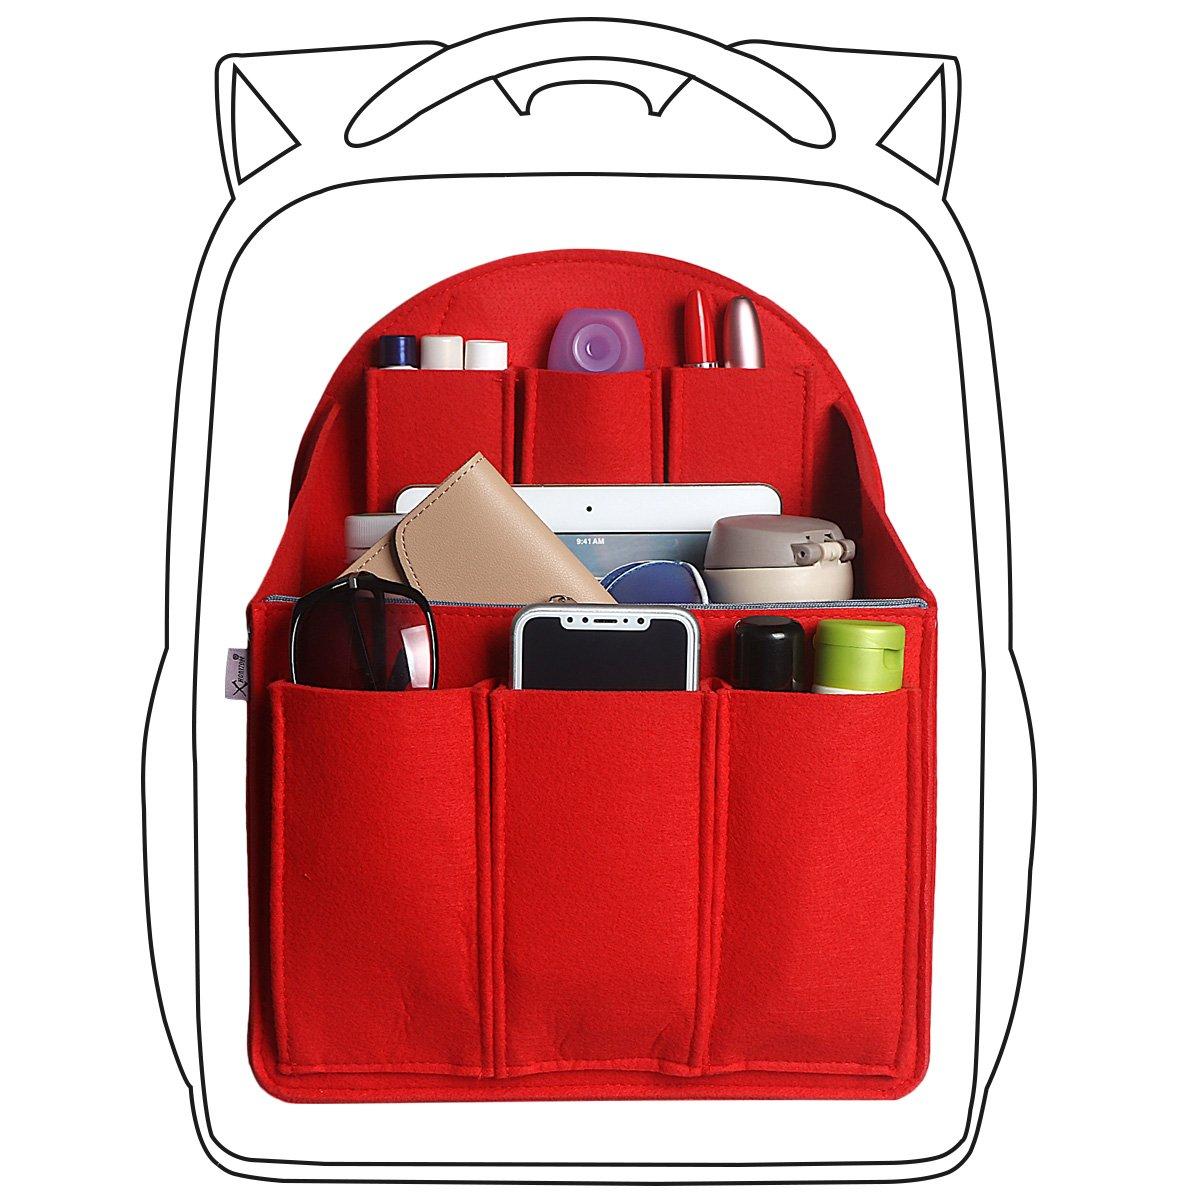 xhorizon SR Purse Organizer Insert Purse Handbag Tote Bag,Bag in Bag Organizer by xhorizon (Image #1)